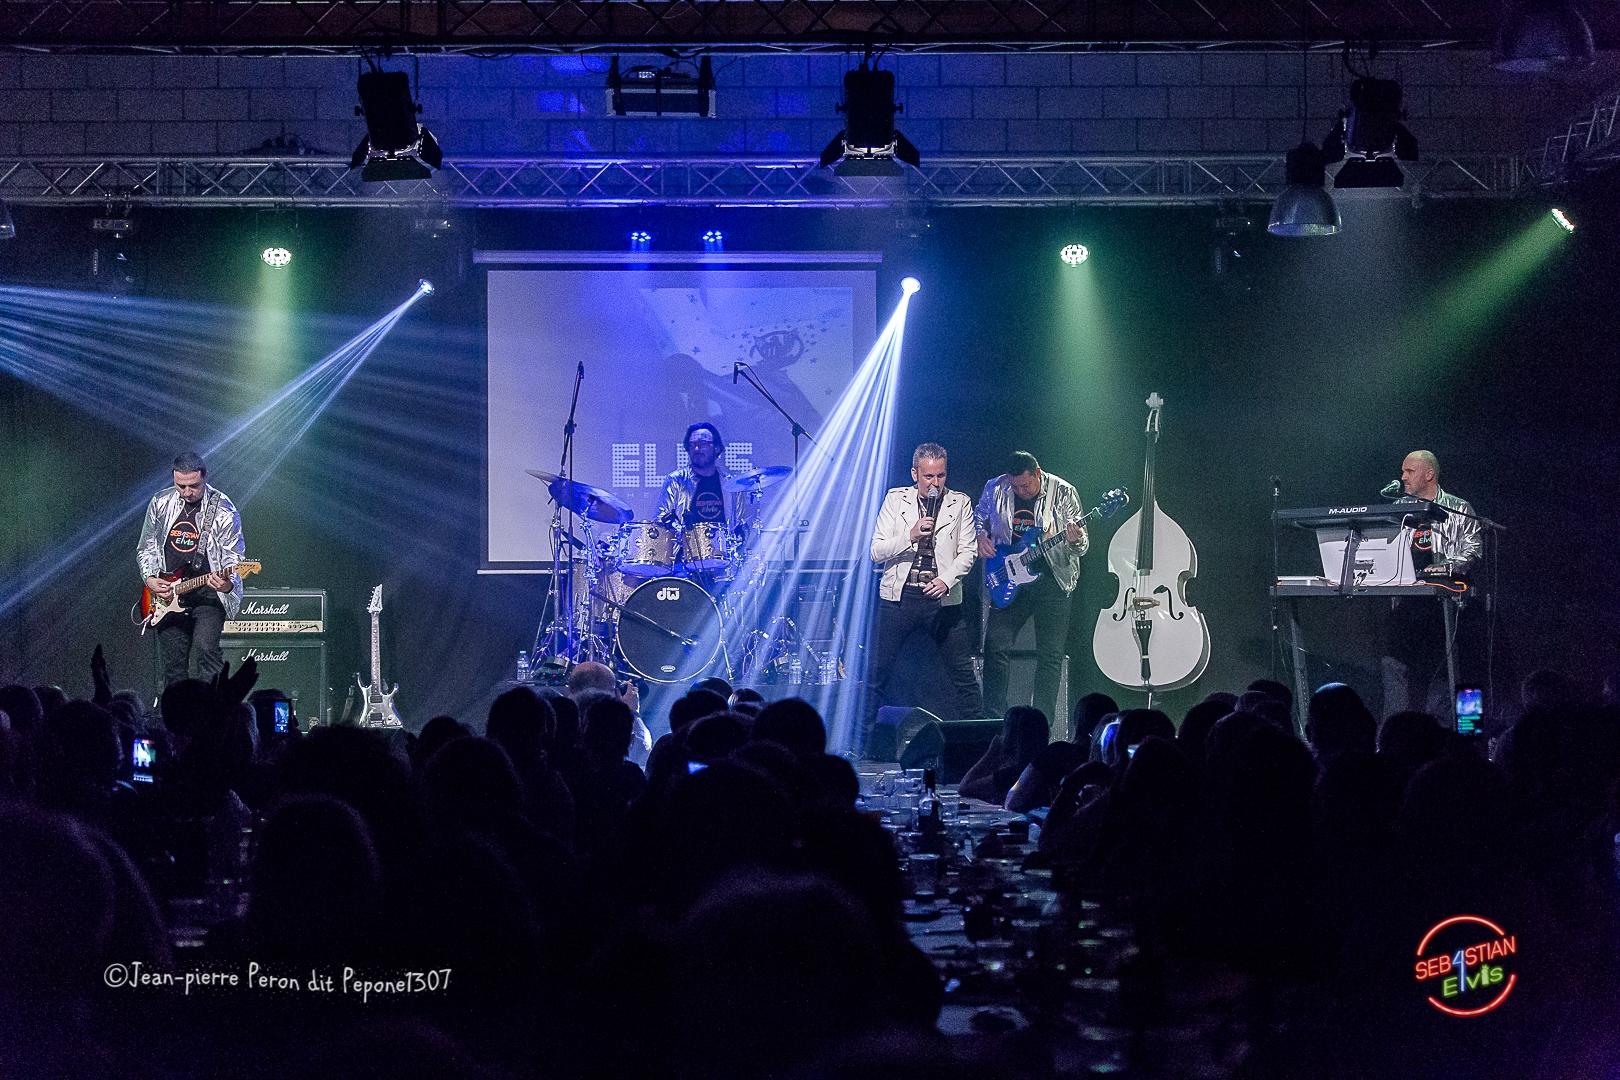 sebastian-for-elvis-pepone1307-centre-culturel-rocourt-facebook-21